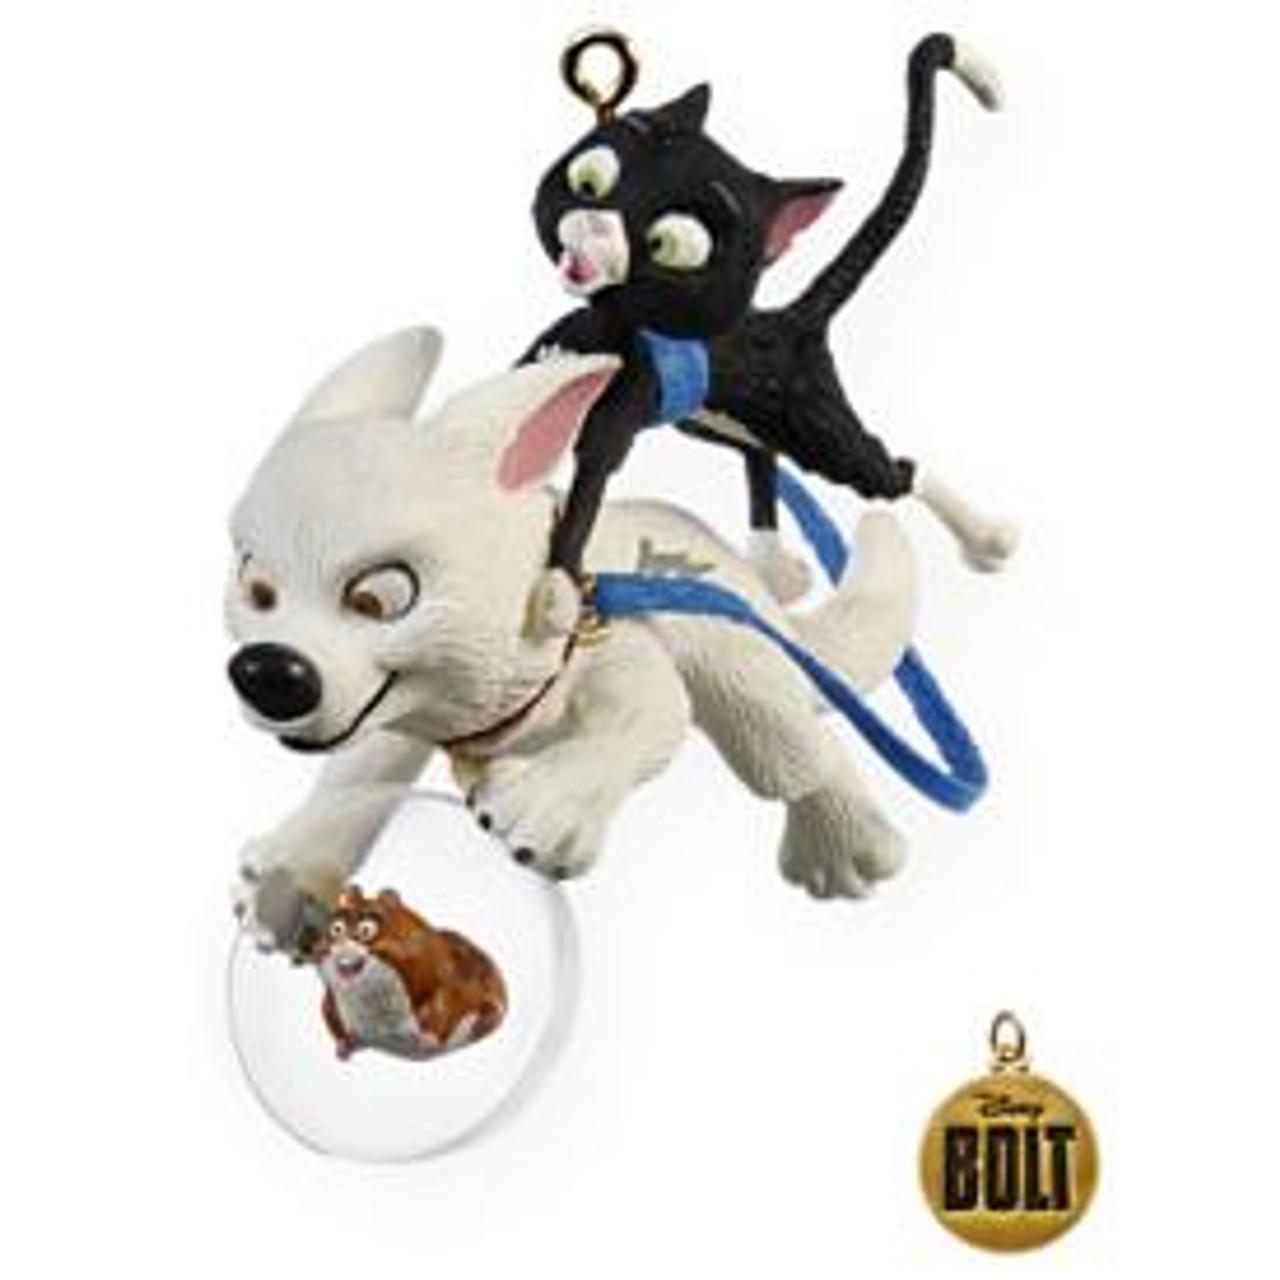 2009 Disney One Unlikely Team Bolt Hallmark Ornament